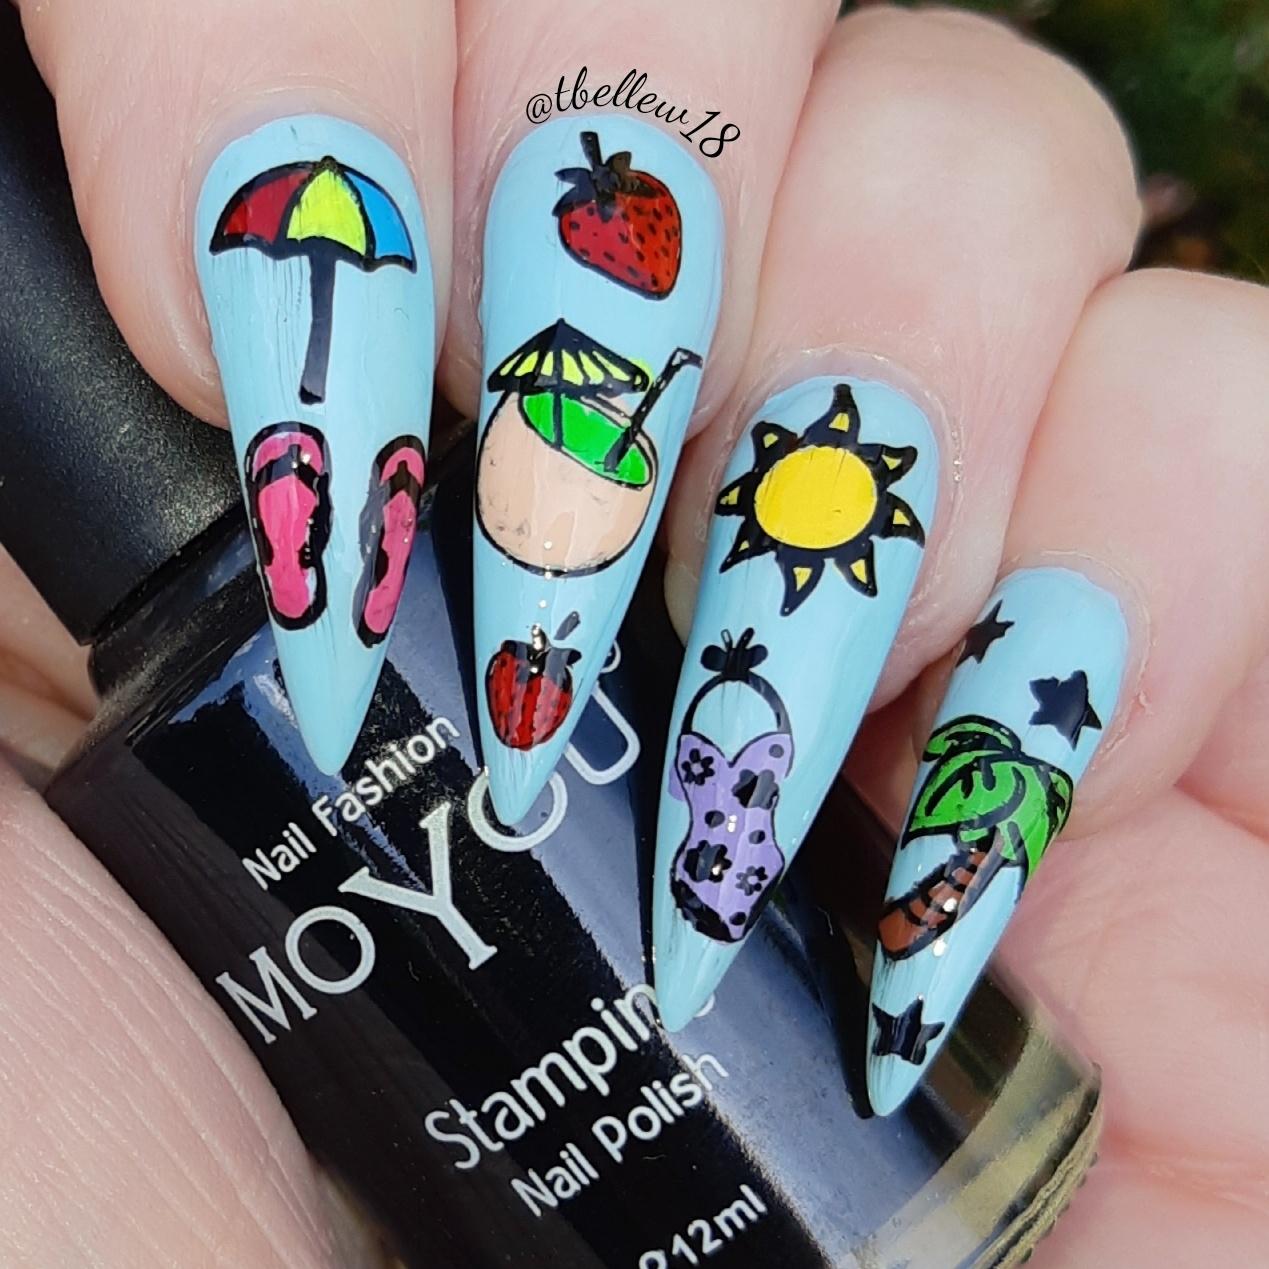 Bite No More: Moyou Nails